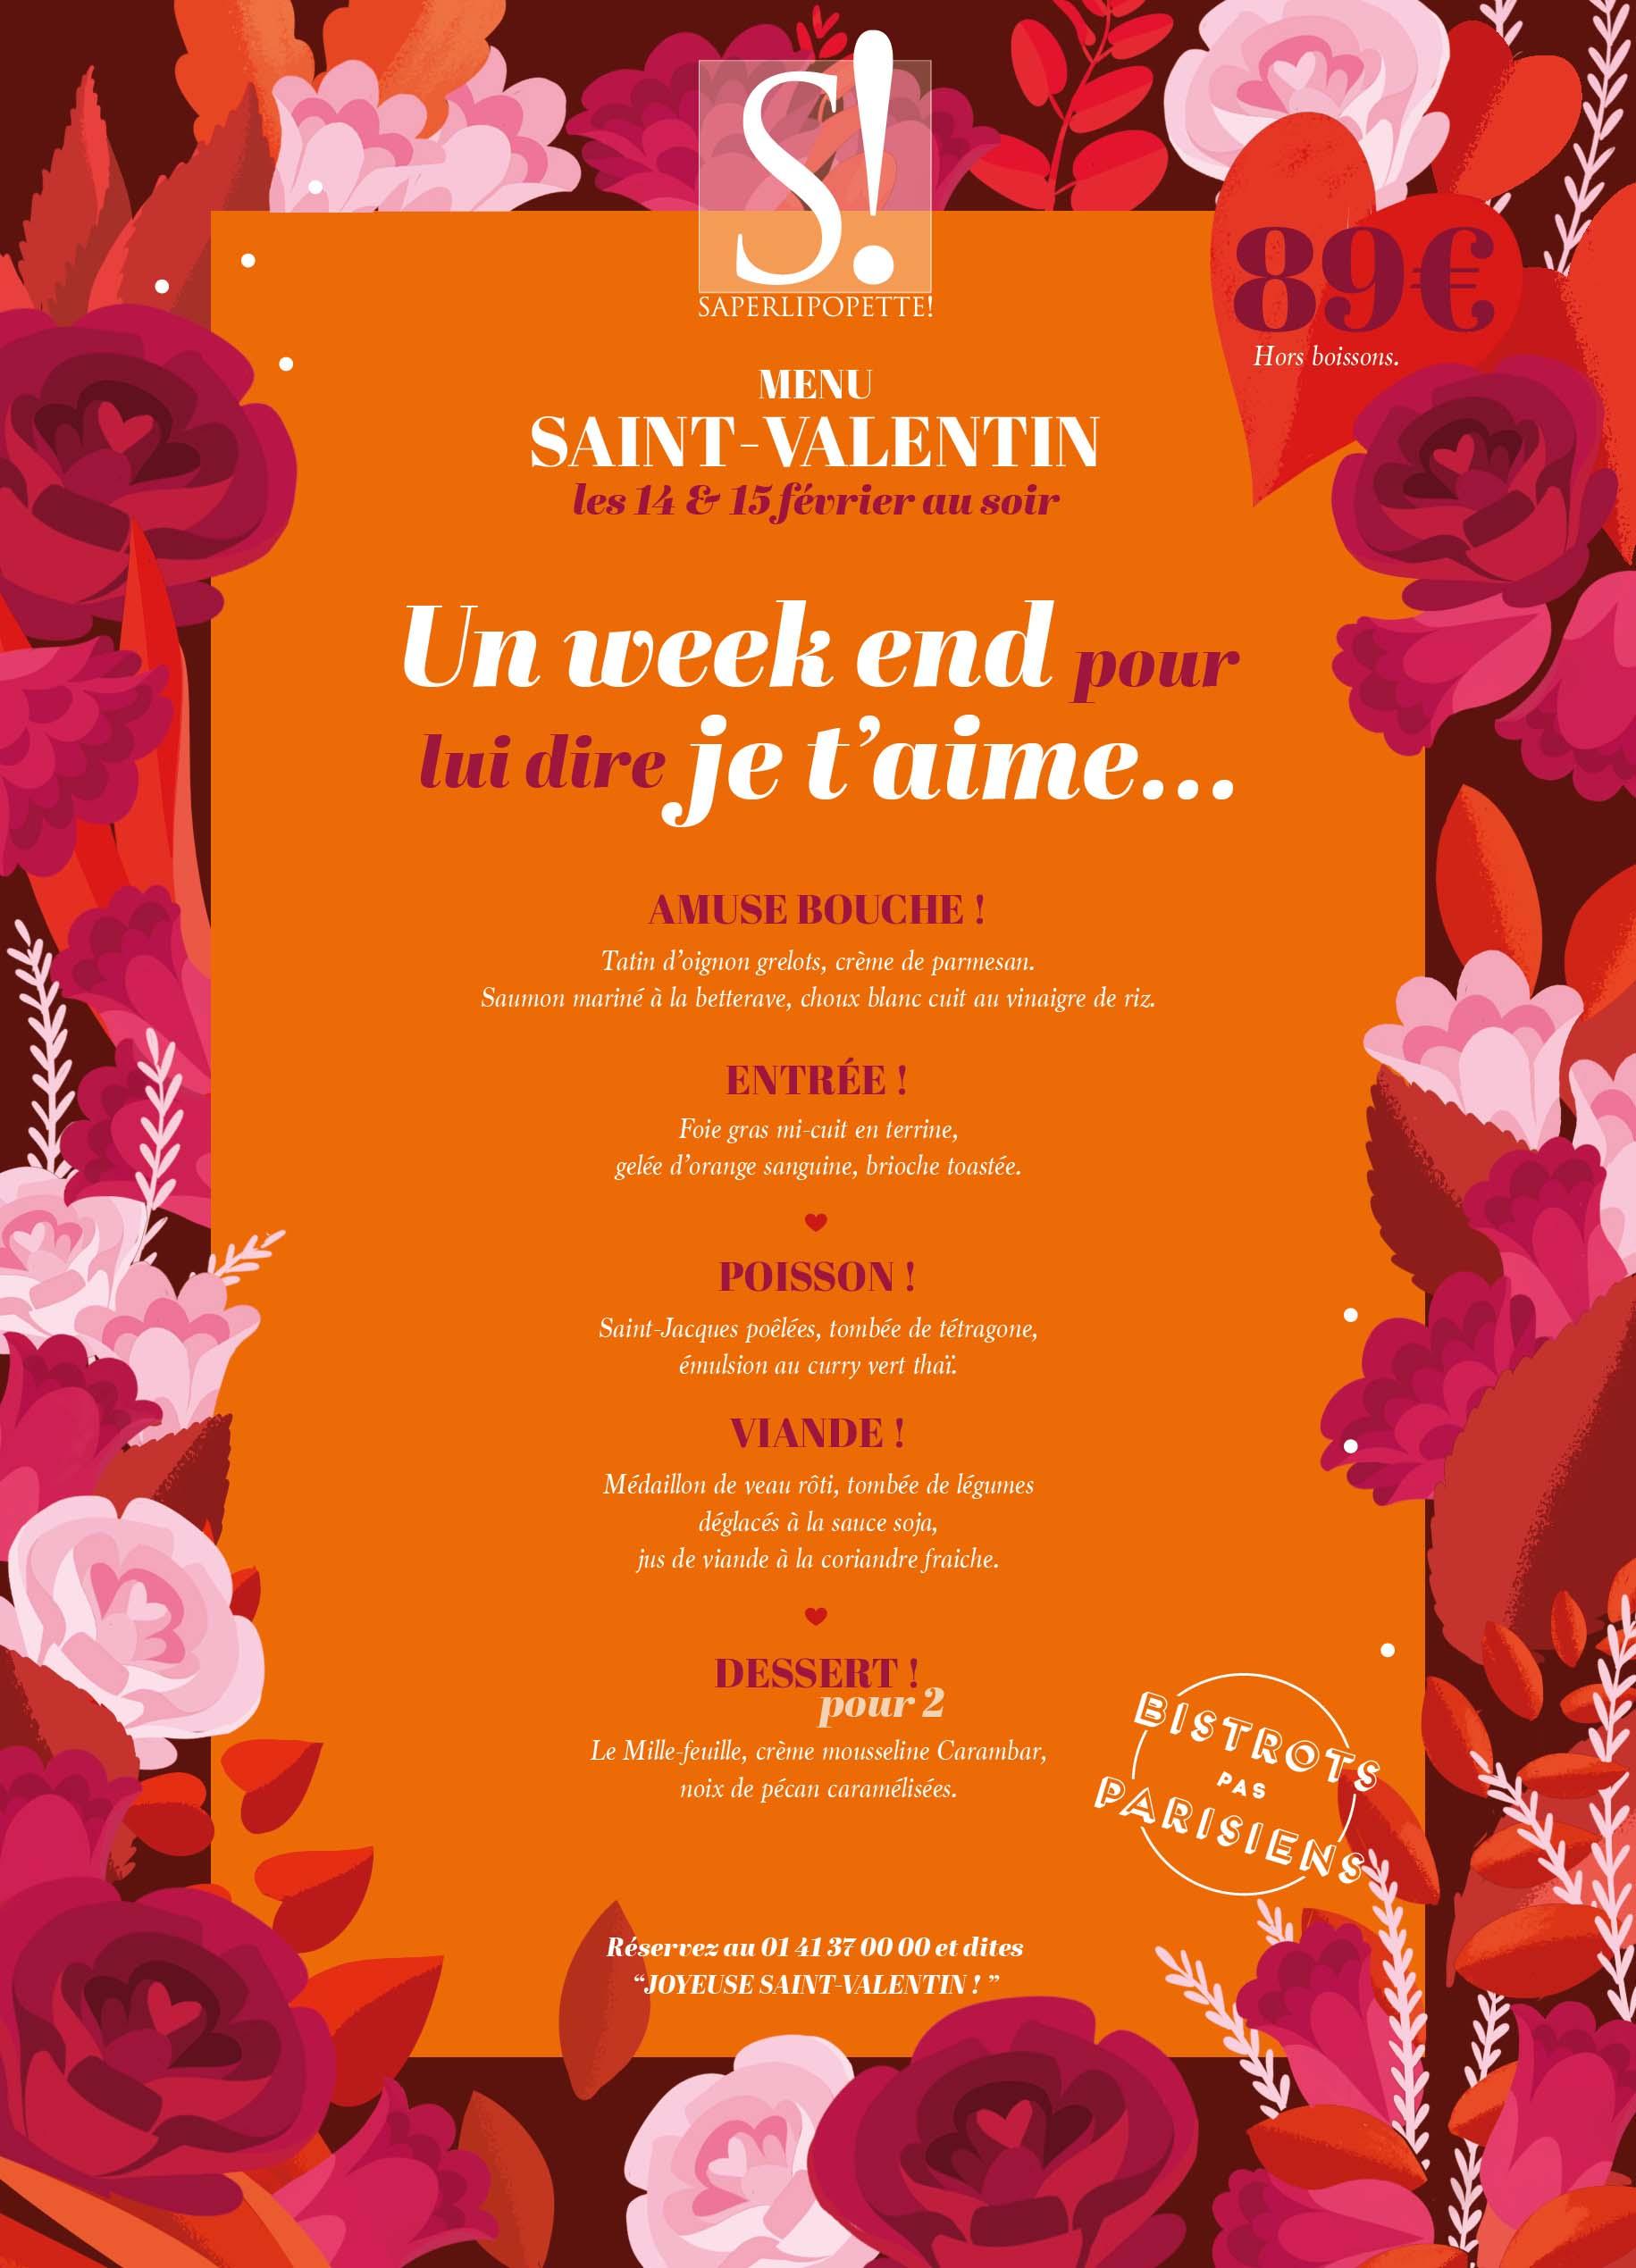 BPP-saintValentin-menu-digital-Saperlipopette